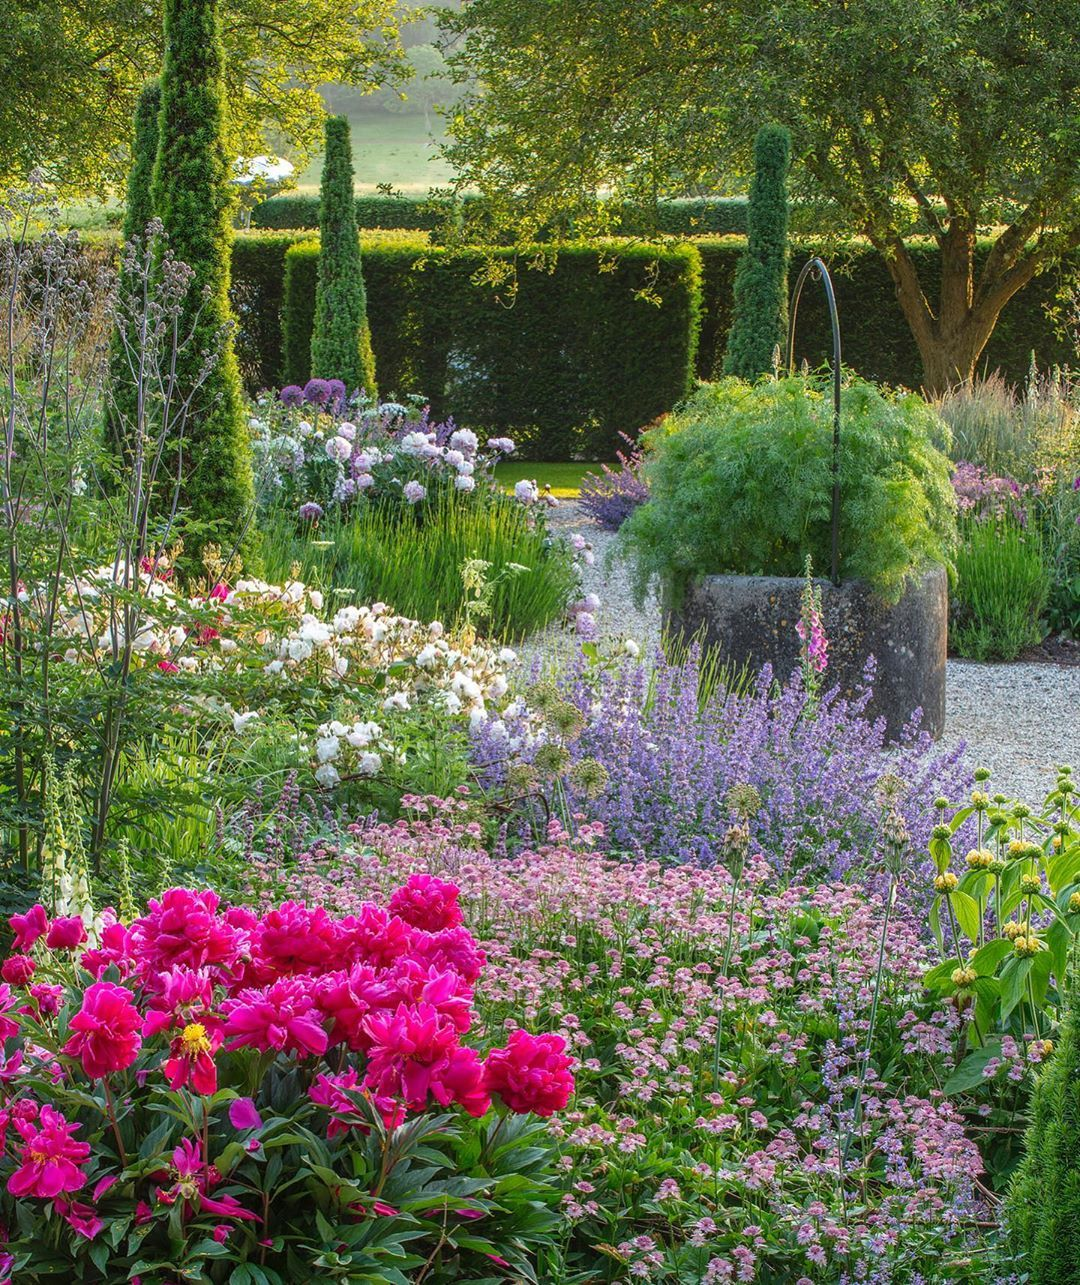 The Stunning Opera Garden Designed By Hannah Gardner At Wormsley In Buckinghamshire Thanks To Theenglishgardenmaga Garden Design Garden Visits English Garden